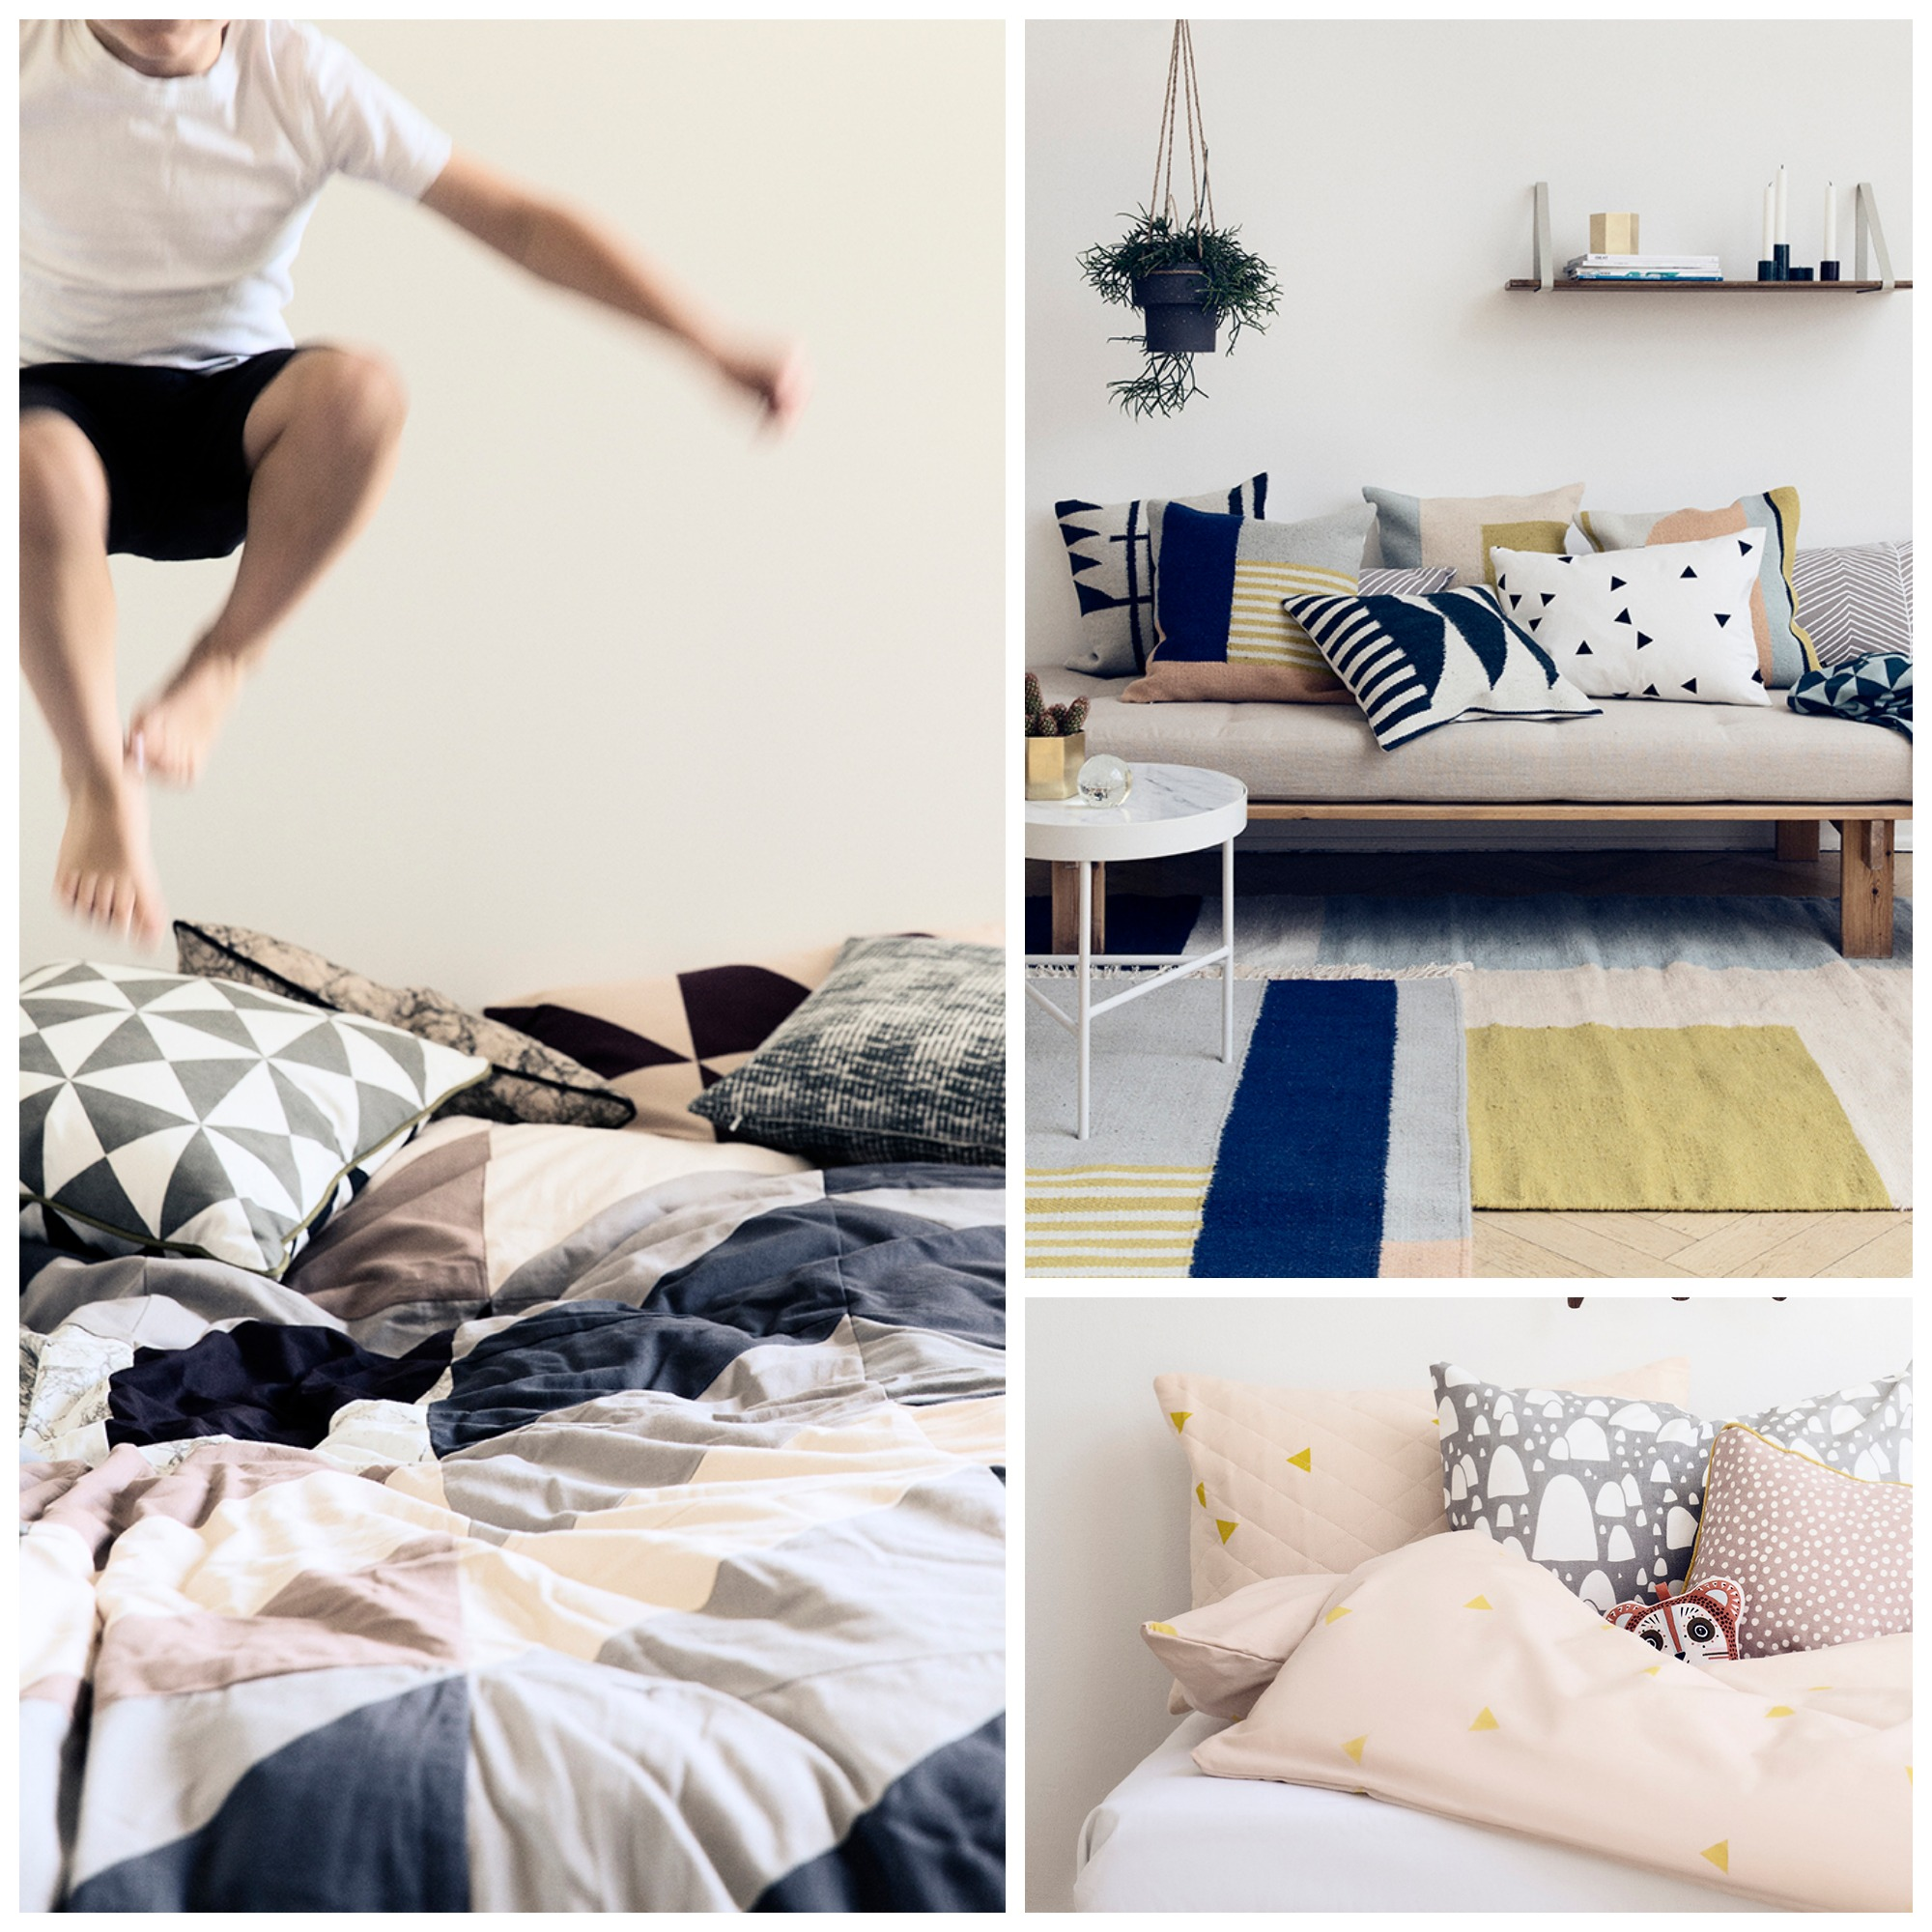 erdbeerwald_ferm_living_bed